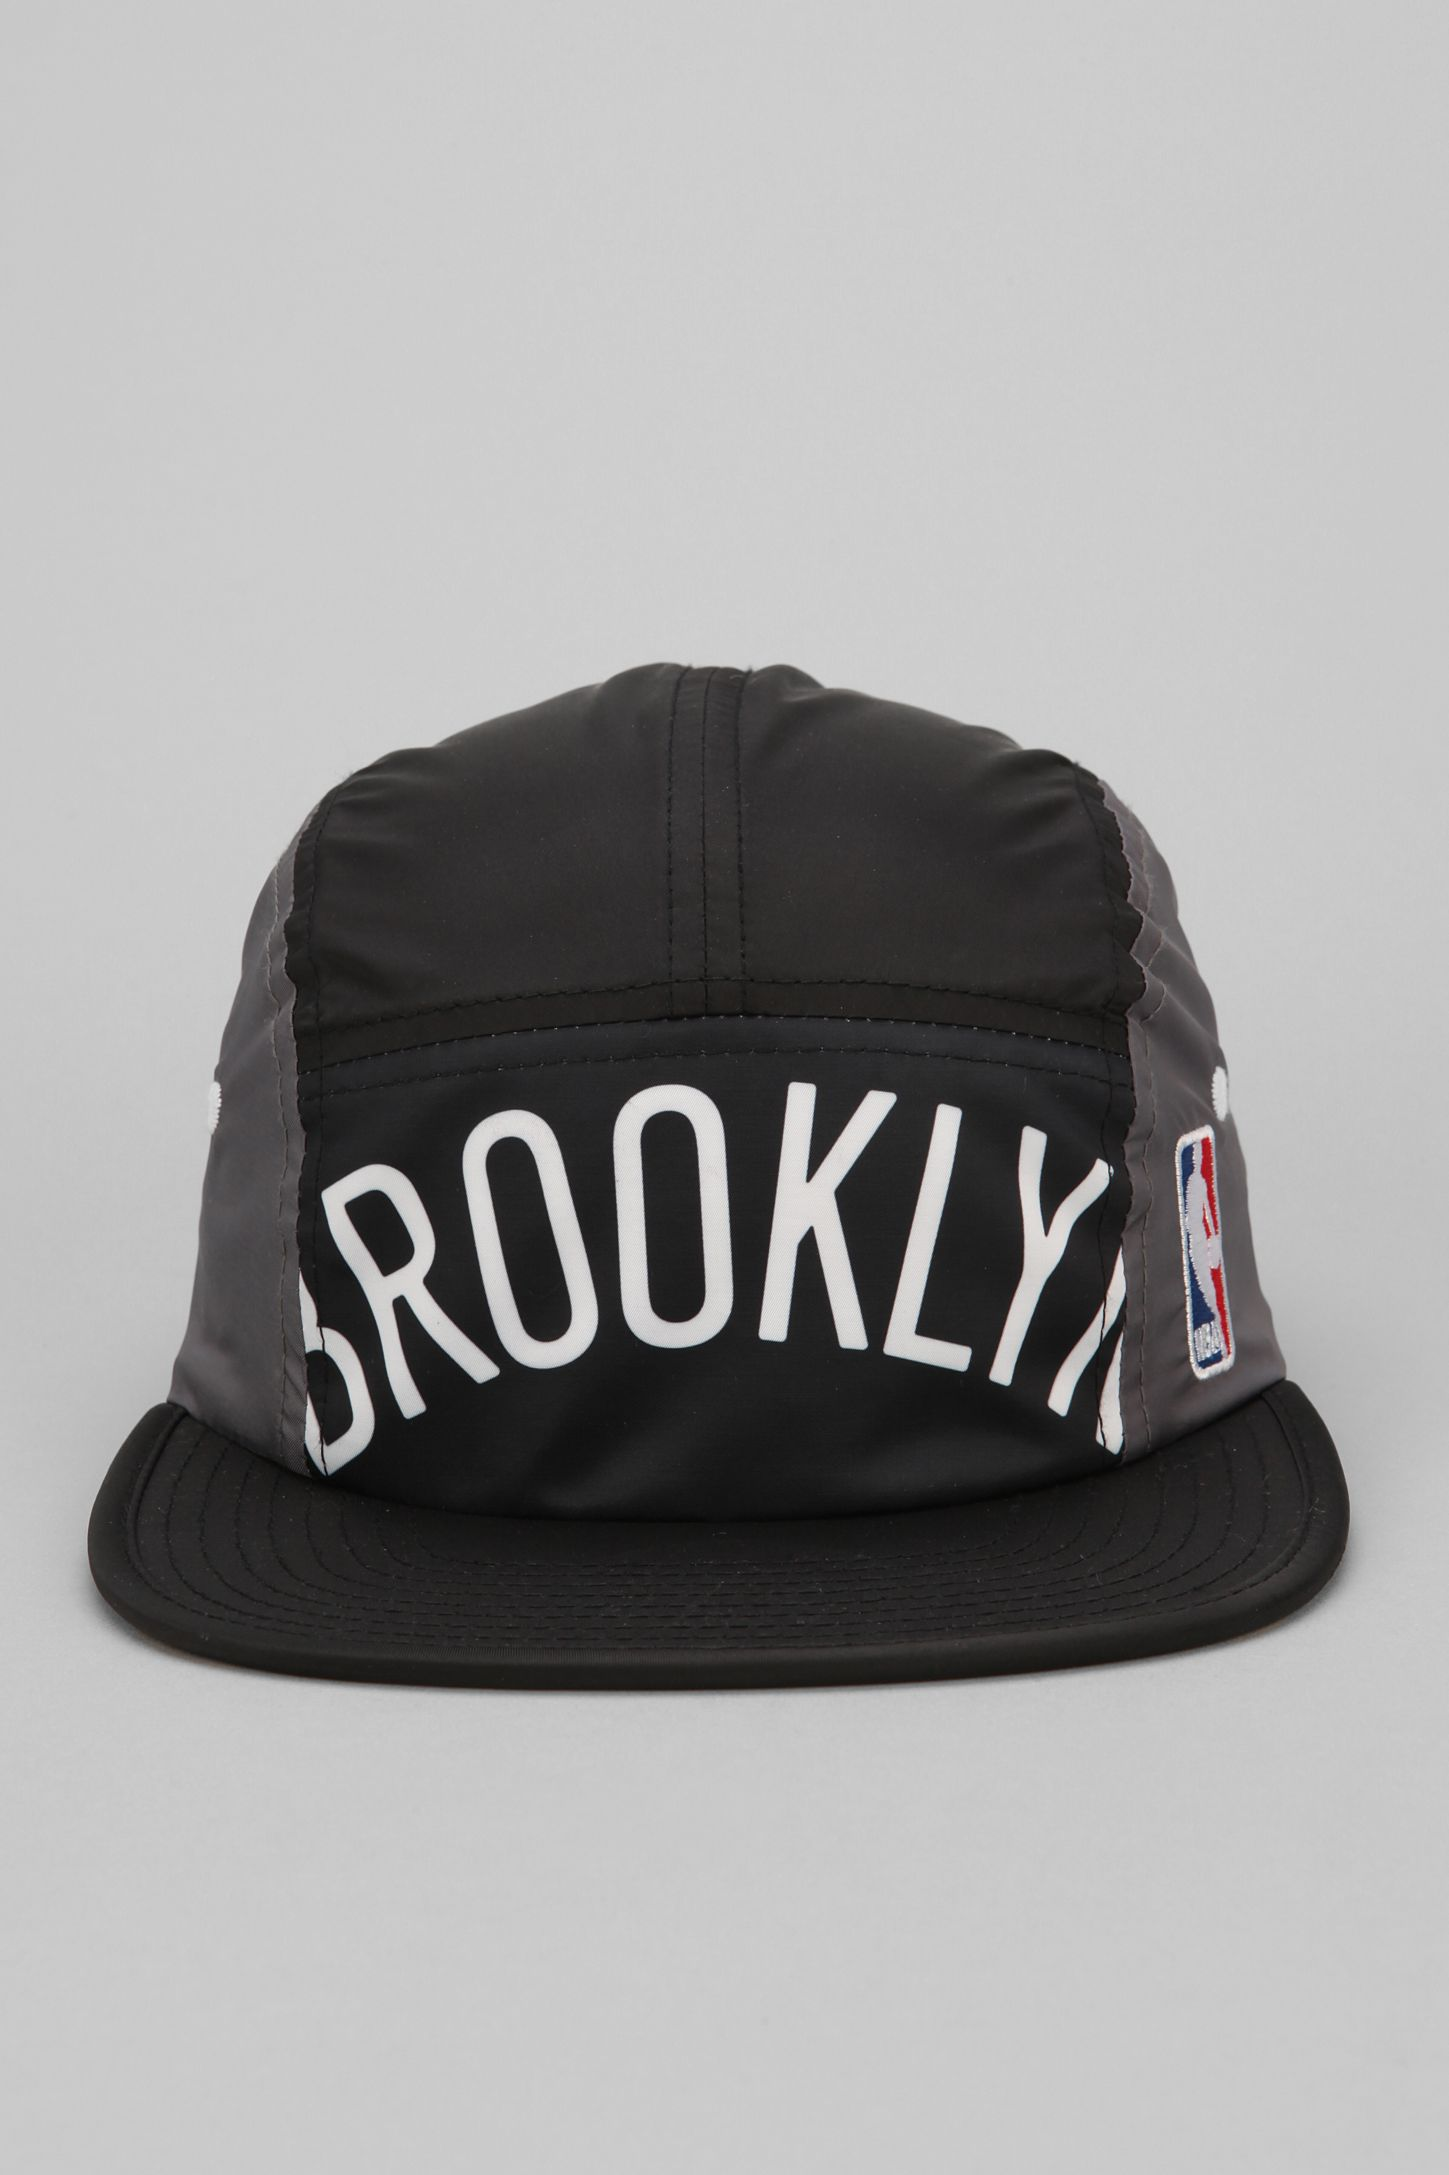 0edf4afa213 Mitchell   Ness Brooklyn Nets Worldmark 5-Panel Hat